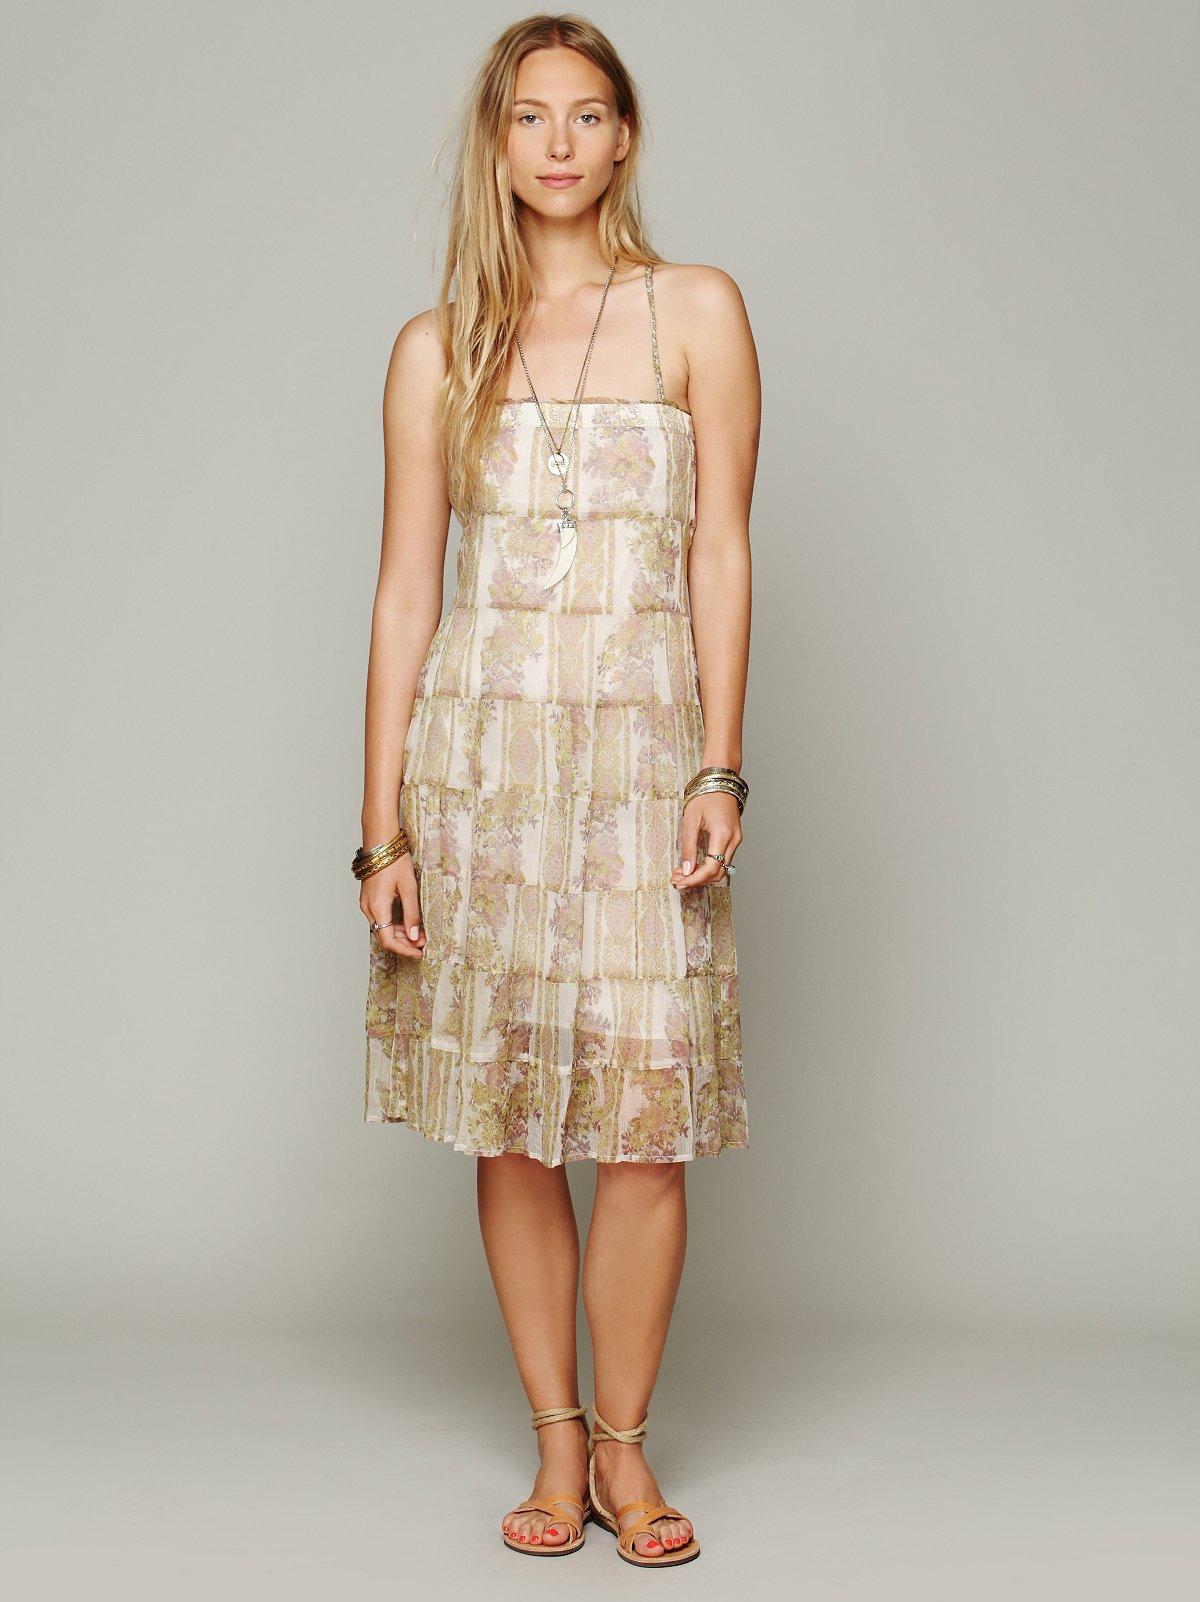 Jessie's Floral Swing Dress